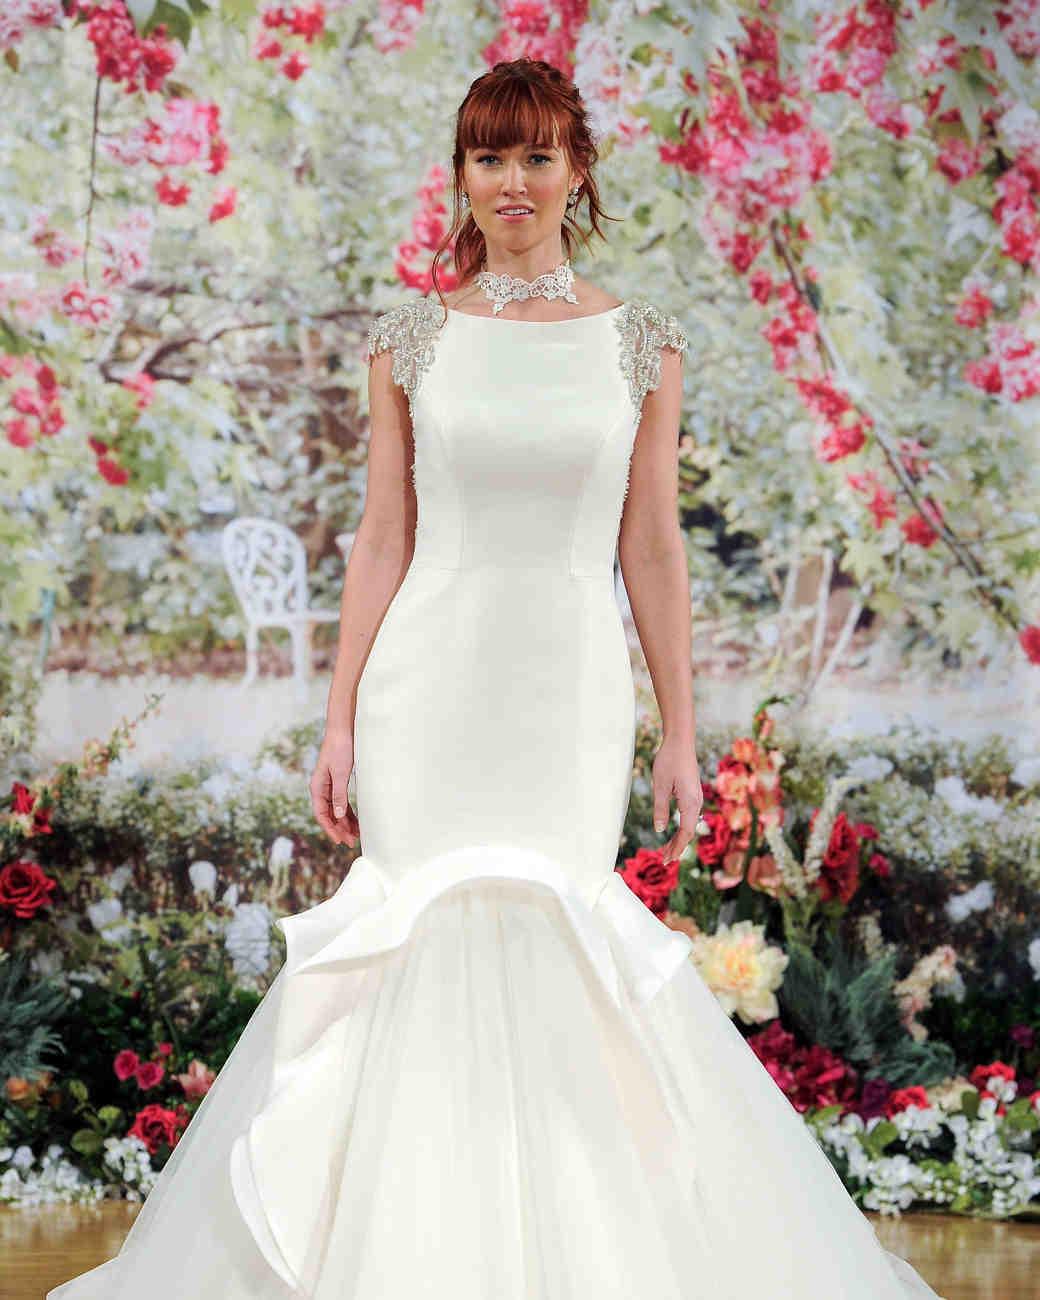 Sottero and Midgley Fall 2017 Wedding Dress with Mermaid Skirt